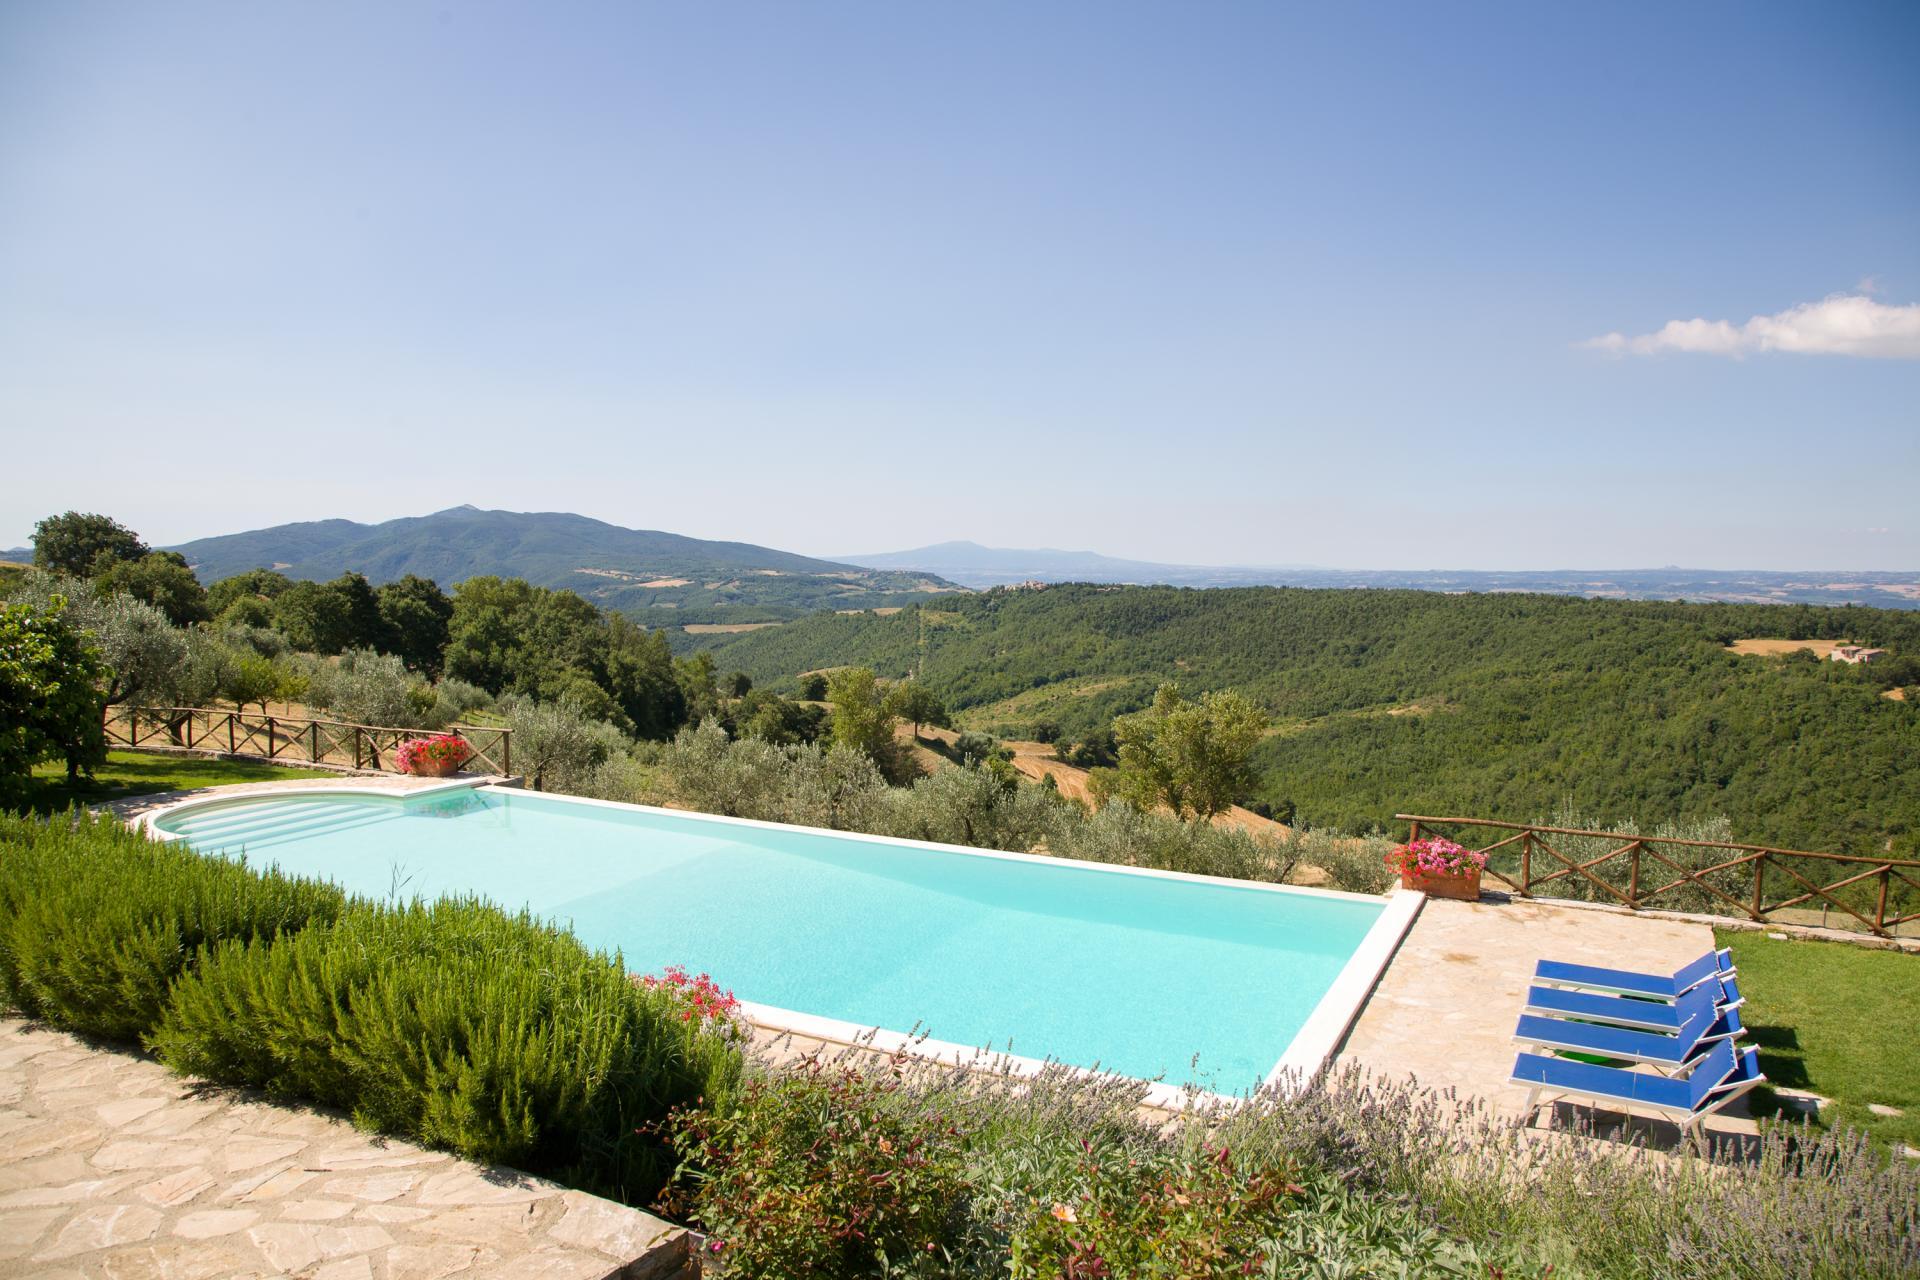 Outdoor Pool Views, Domus Romana, Todi, Umbria.